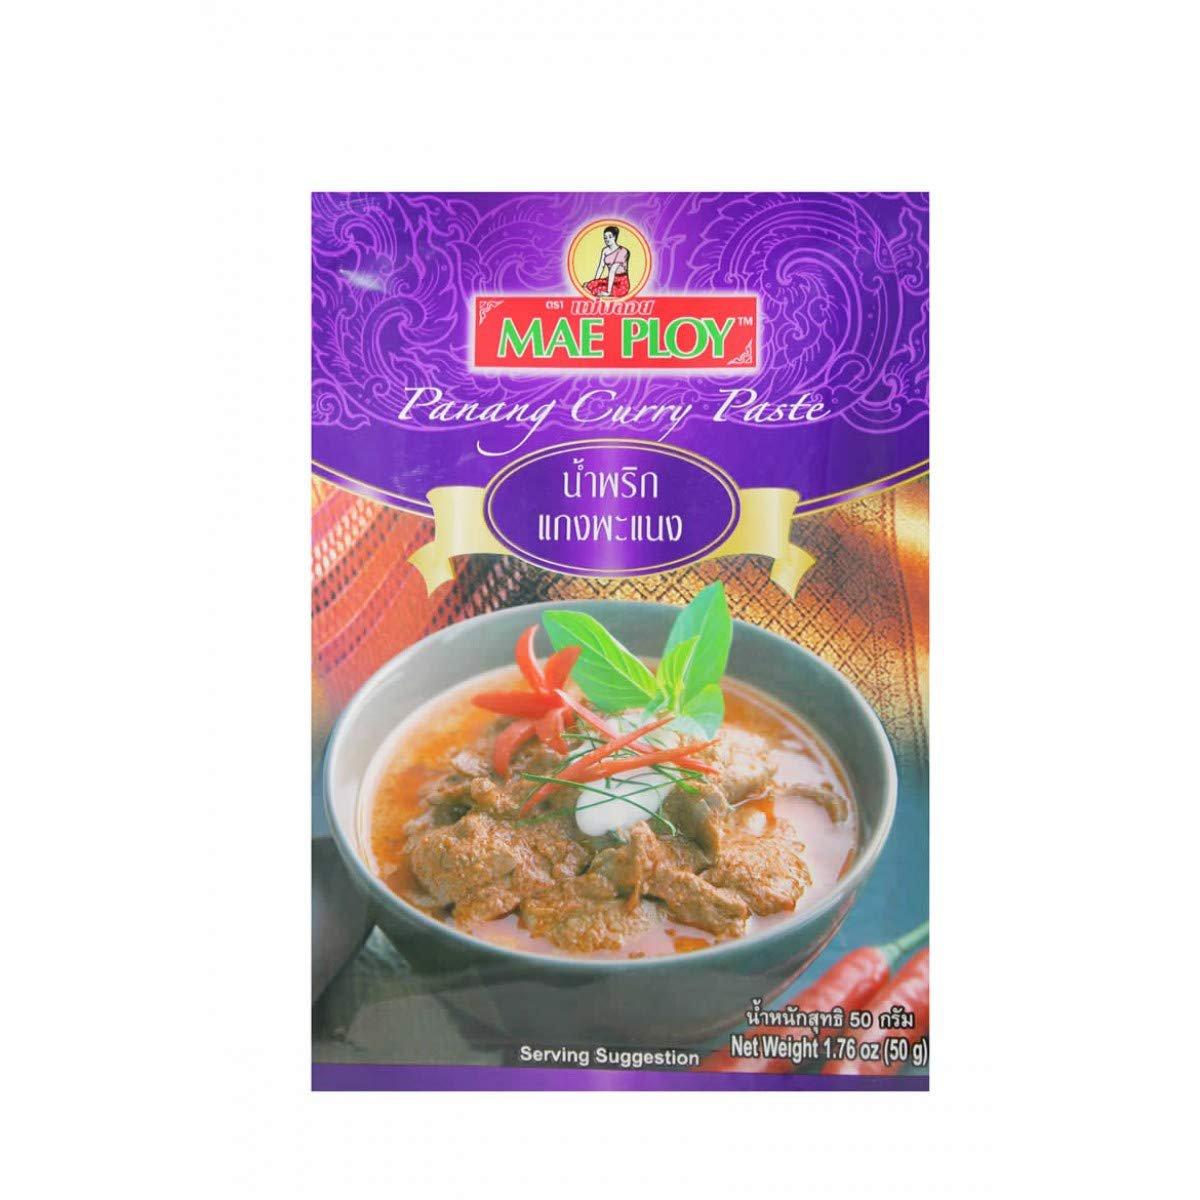 MAE PLOY BRAND Panang Curry Paste, 50g(1.76oz) X 4 Packs